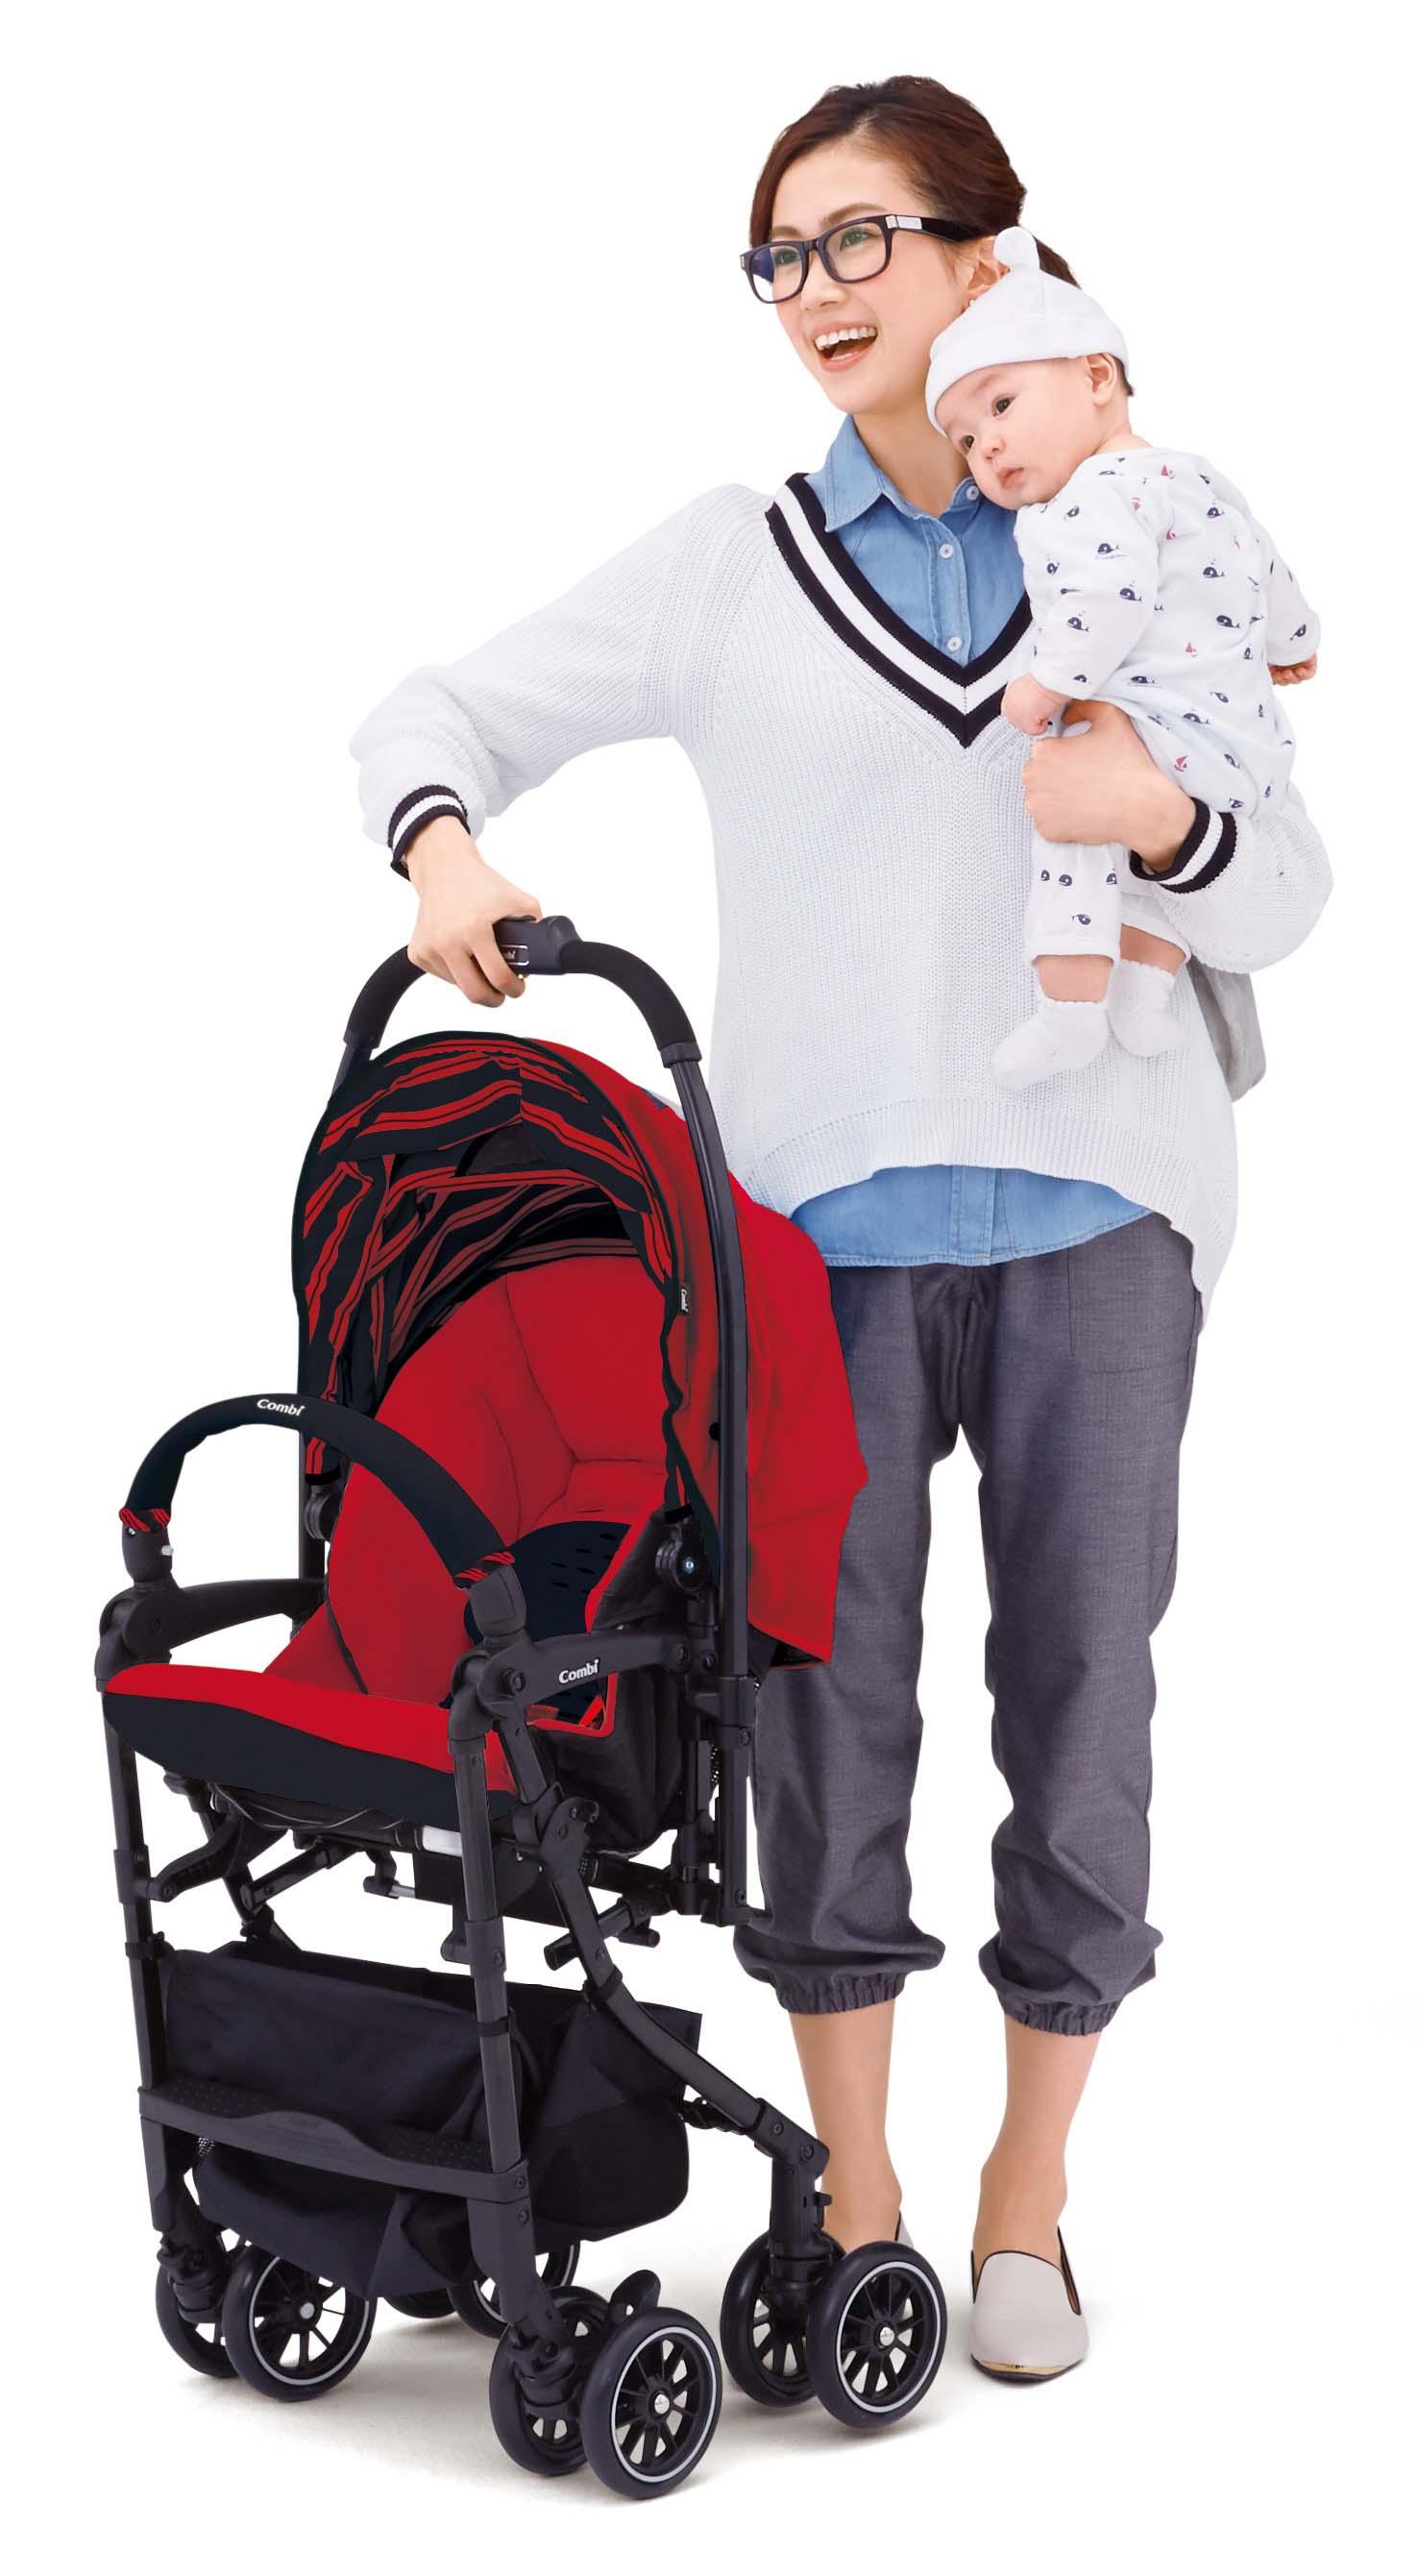 Xe đẩy trẻ em Combi Urban Walker Lite